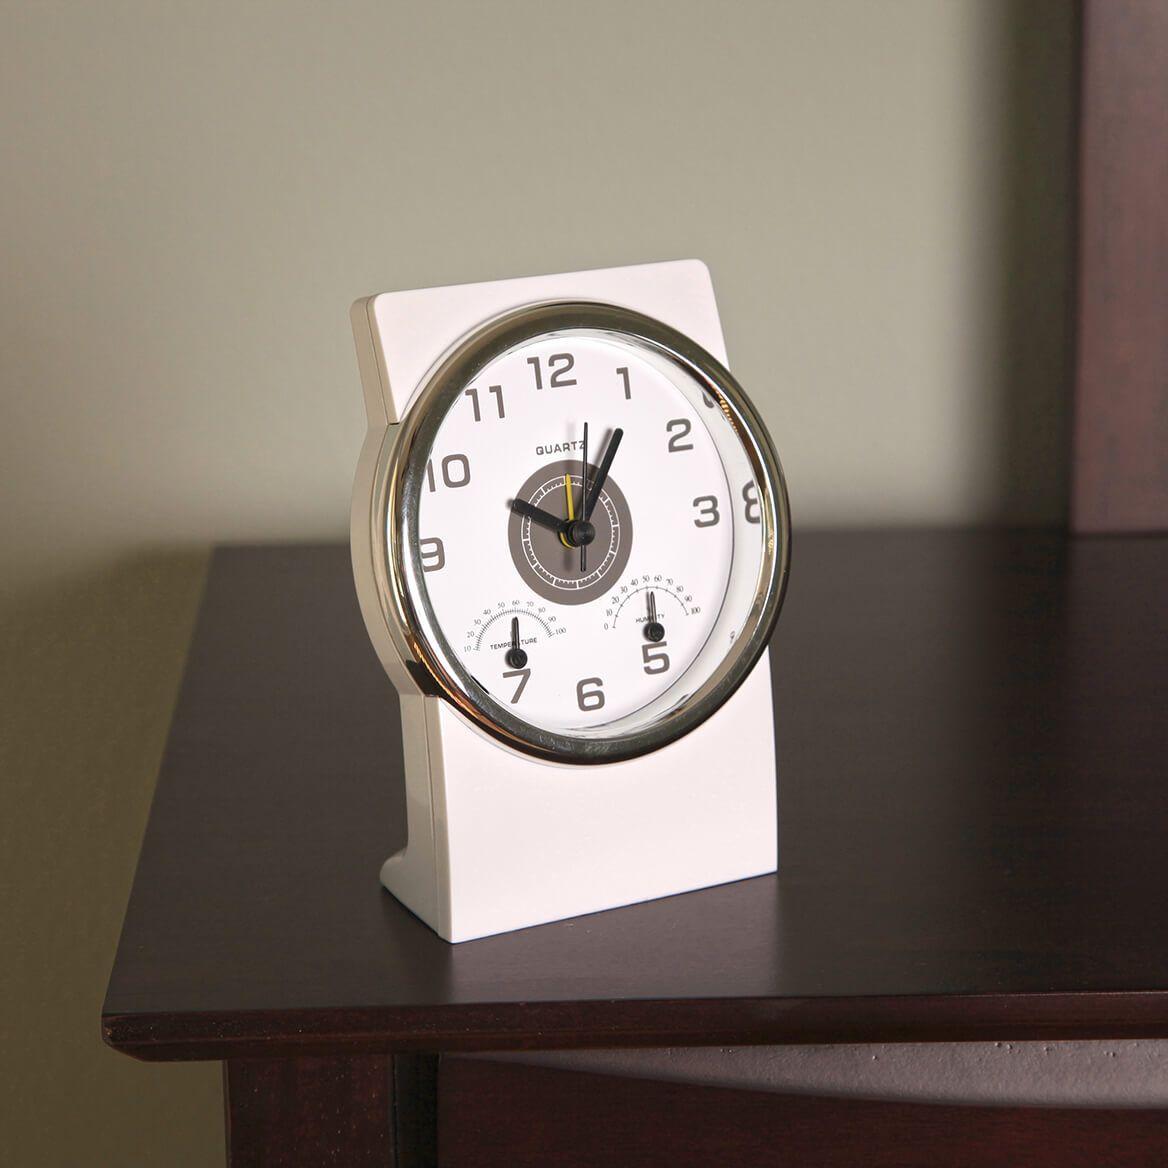 Deluxe Weather Station Alarm Clock-369686